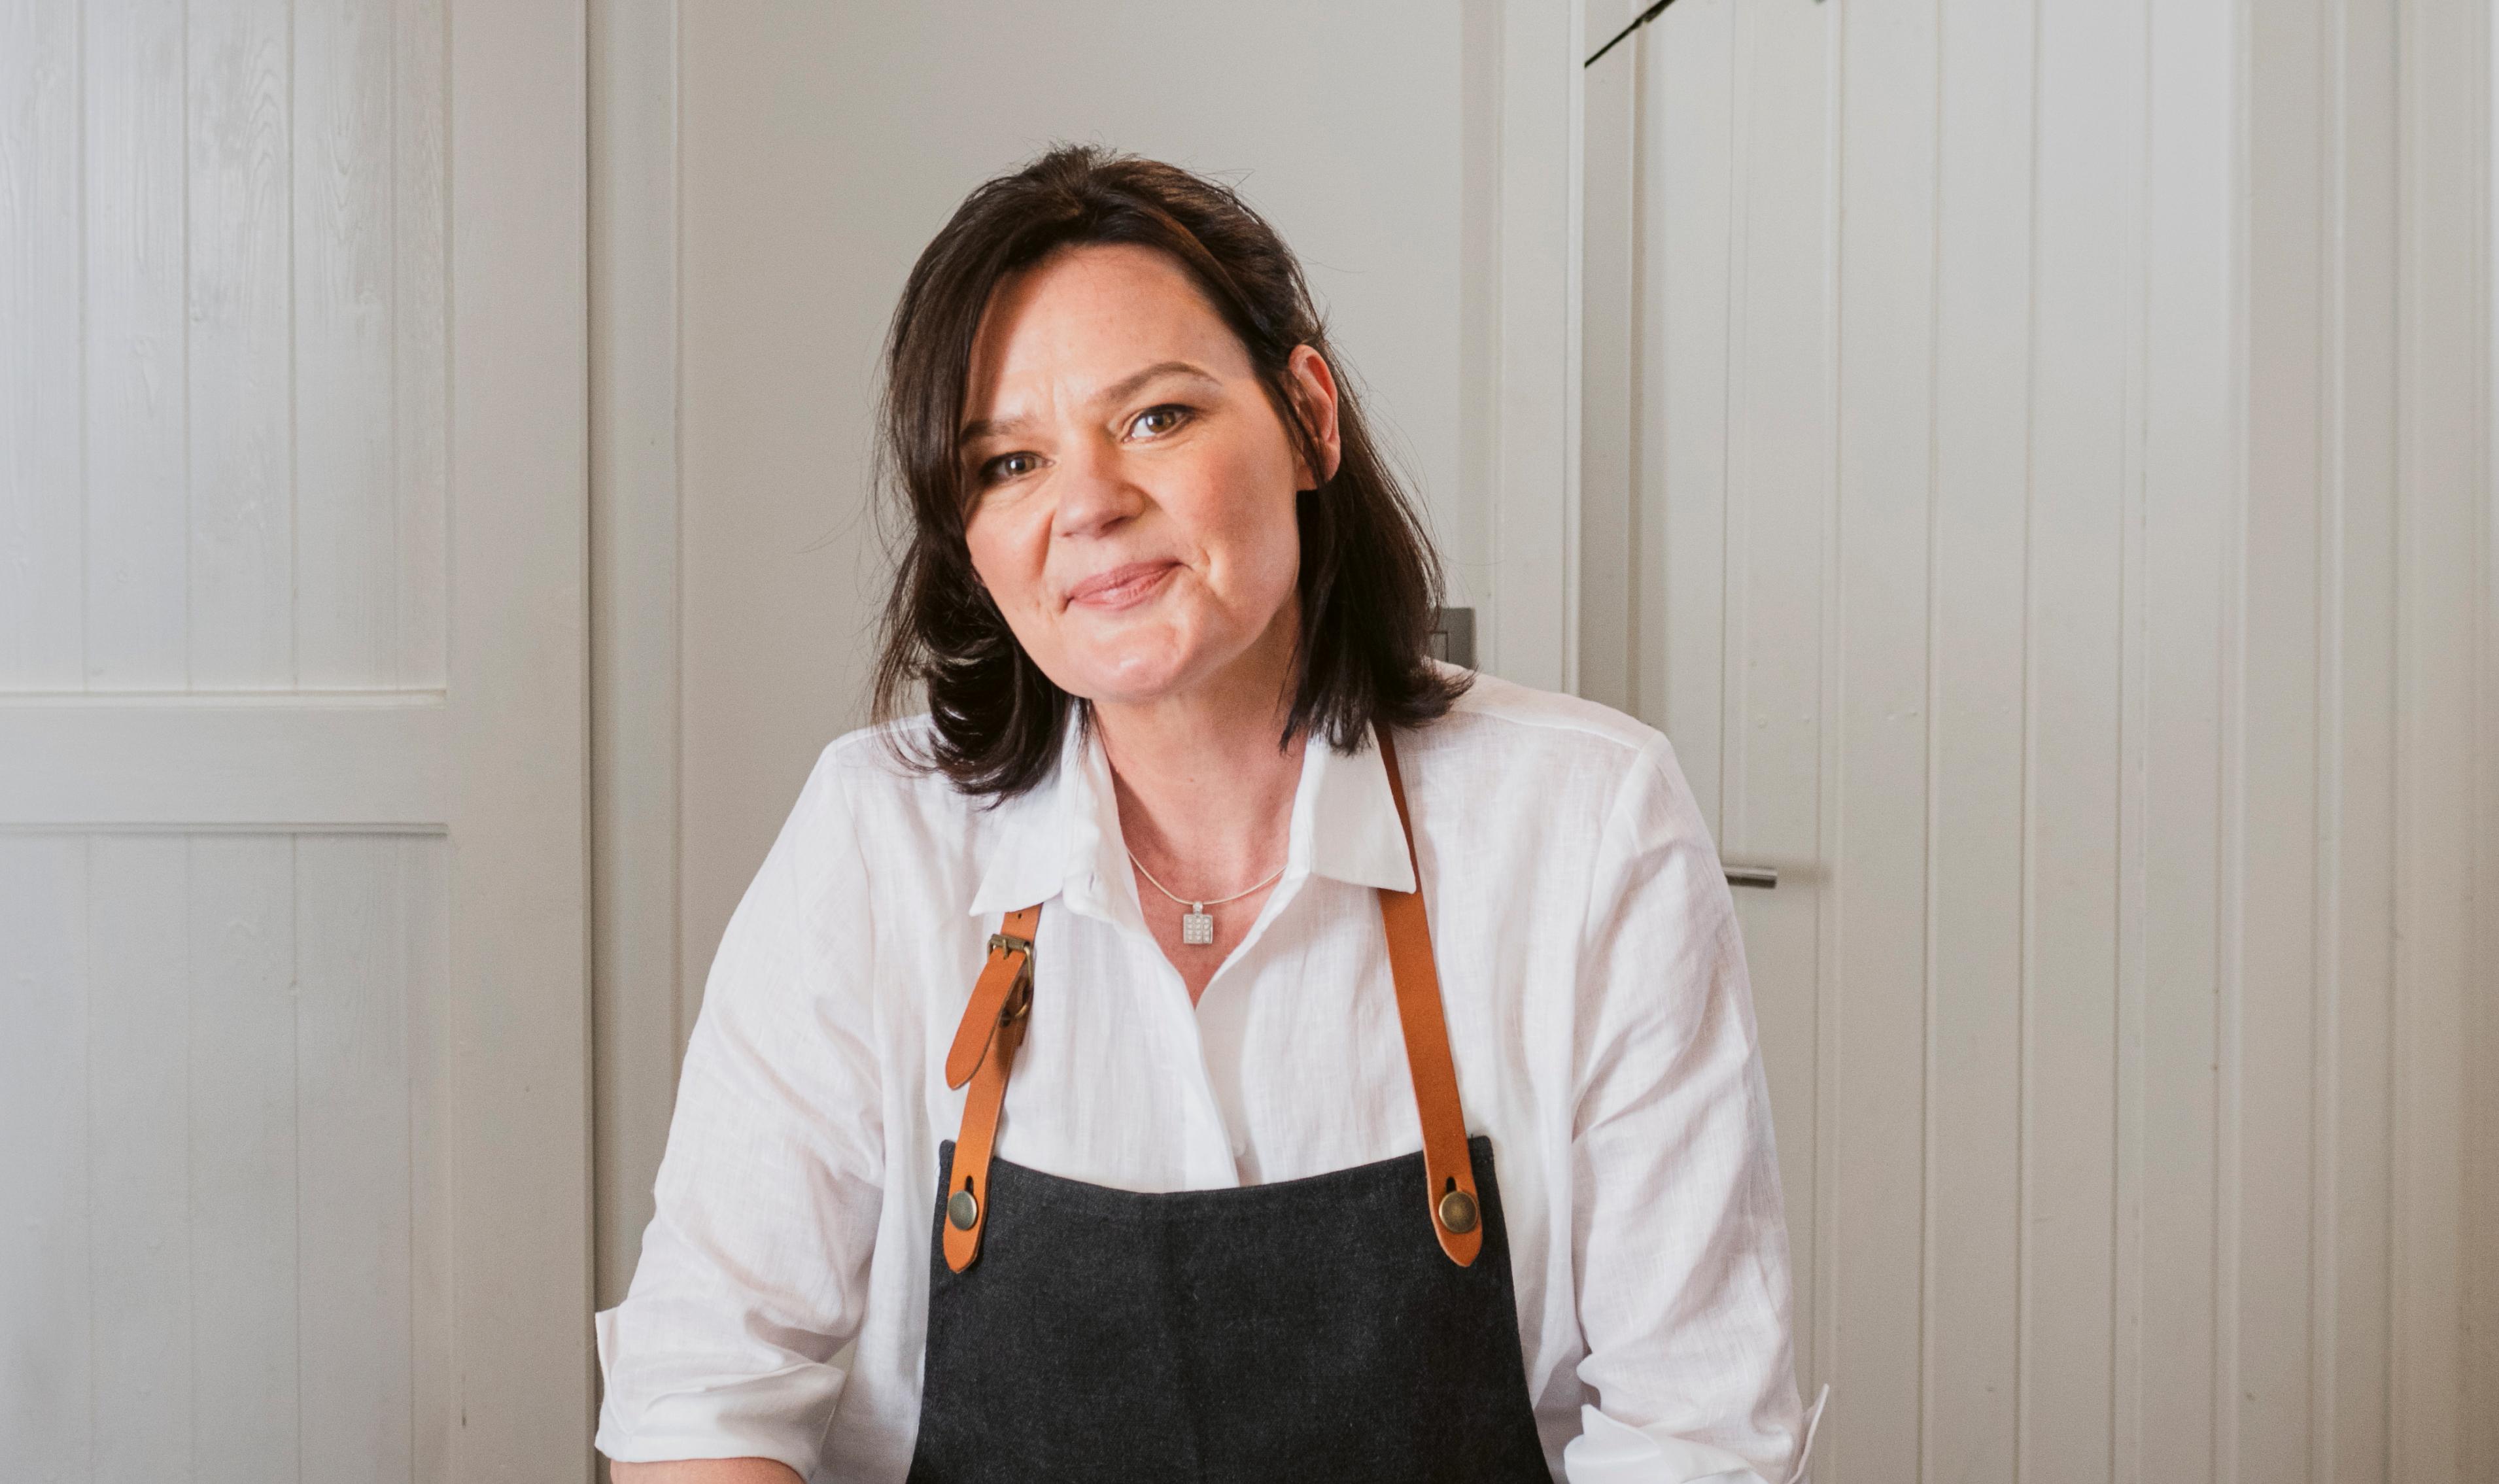 The Australian chef - Belinda MacDonald